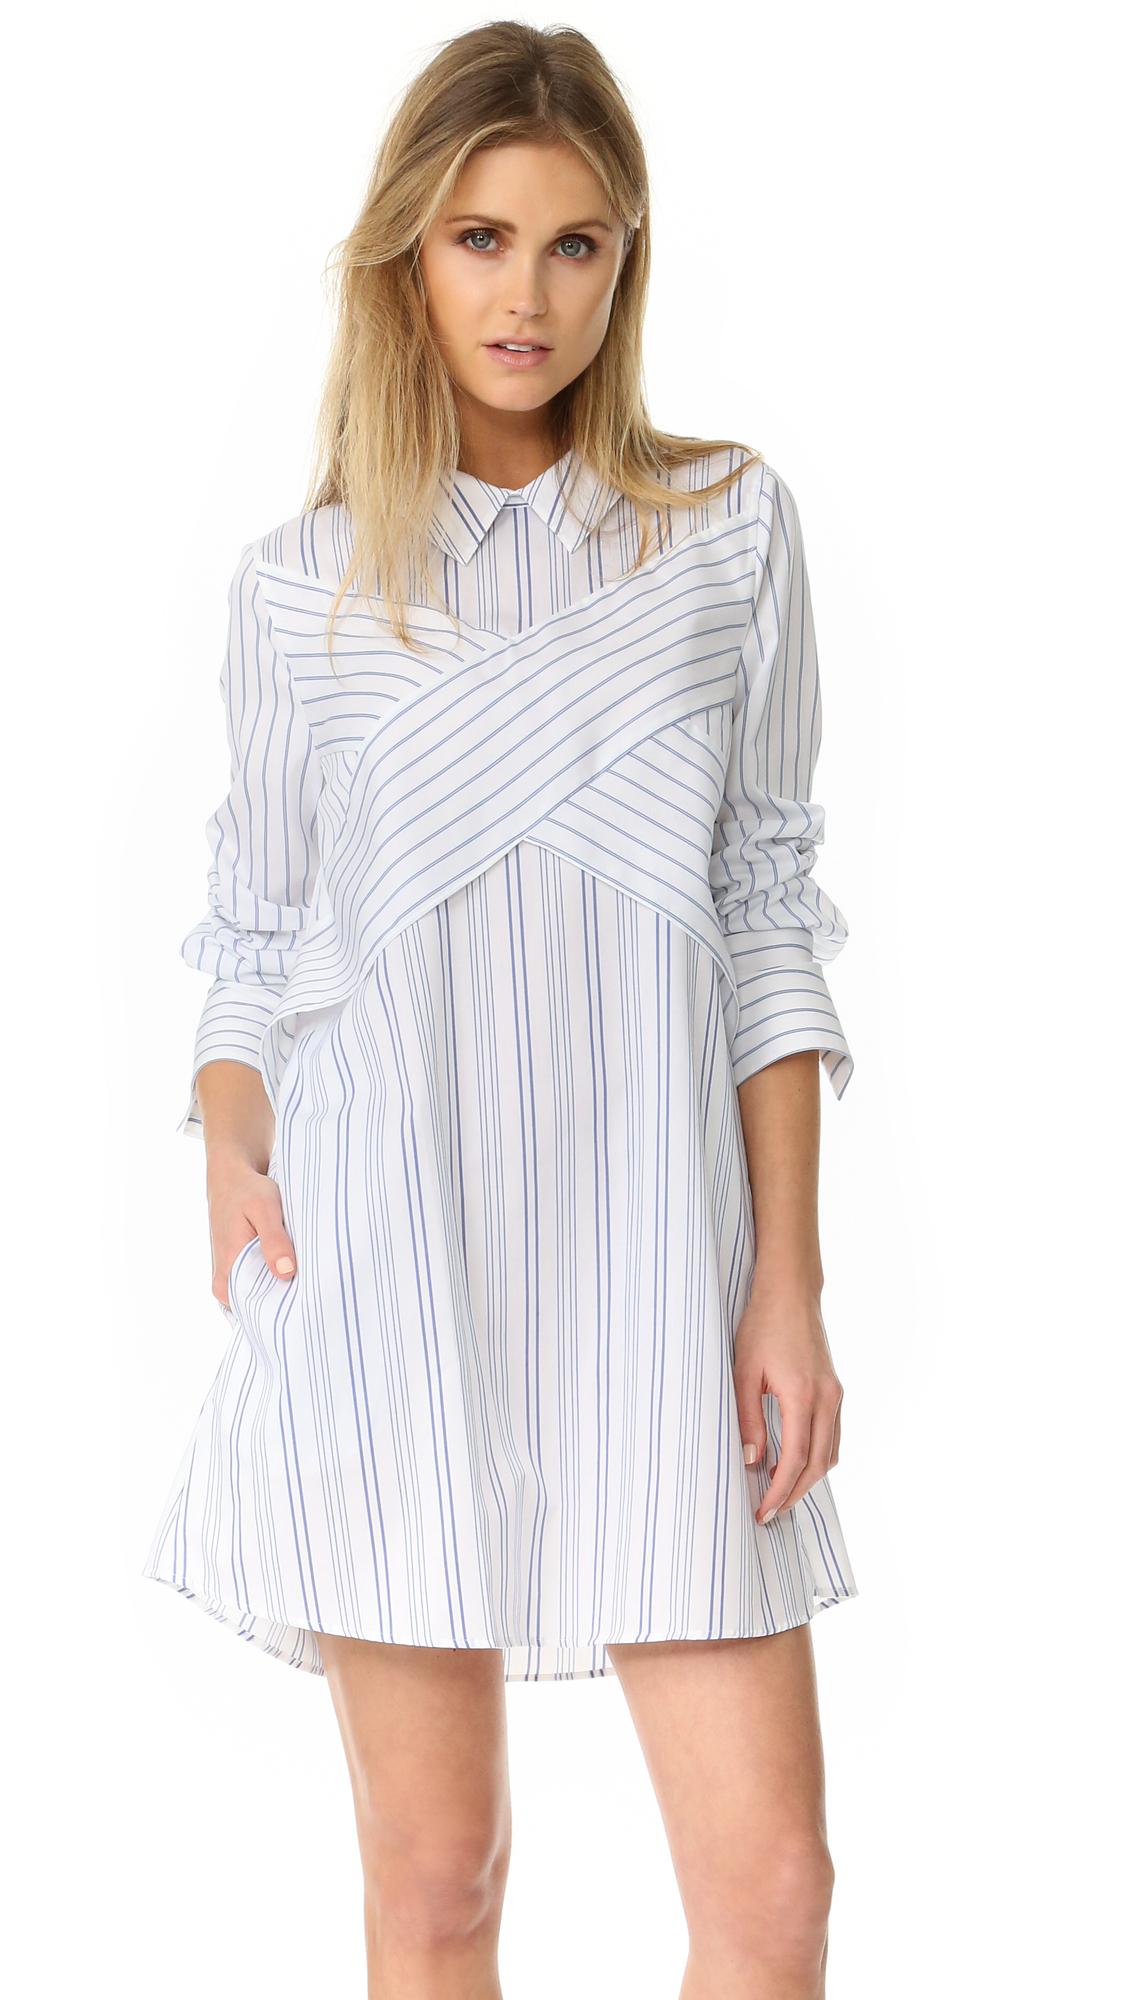 Bcbgmaxazria Crisscross Shirtdress - Blue White Combo at Shopbop